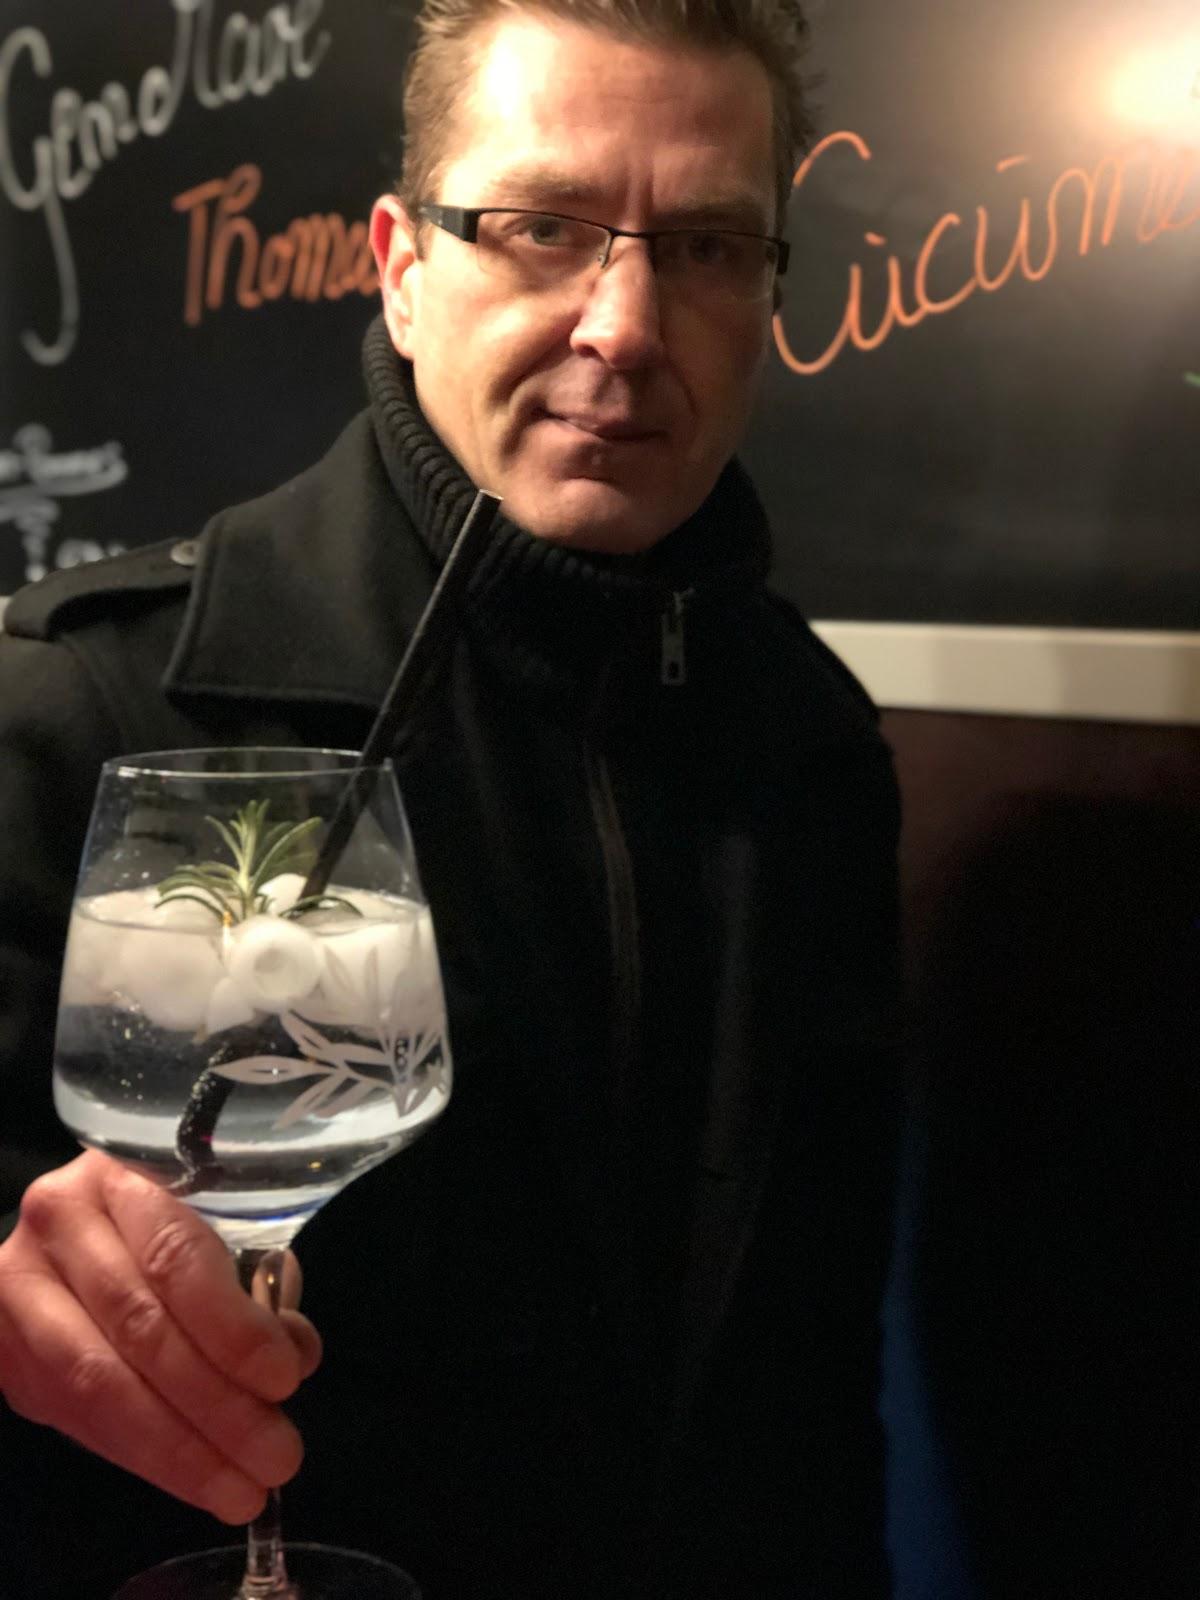 Marcus Herbst, Team HBB, 4 Gin and Drinks, Horseboxbar, Event-Bar, mobile Bar, Bayern, Garmisch-Partenkirchen, Gin-Bar, Oberammergau, König-Ludwig-Lauf by Uschi Glas 4 weddings and events